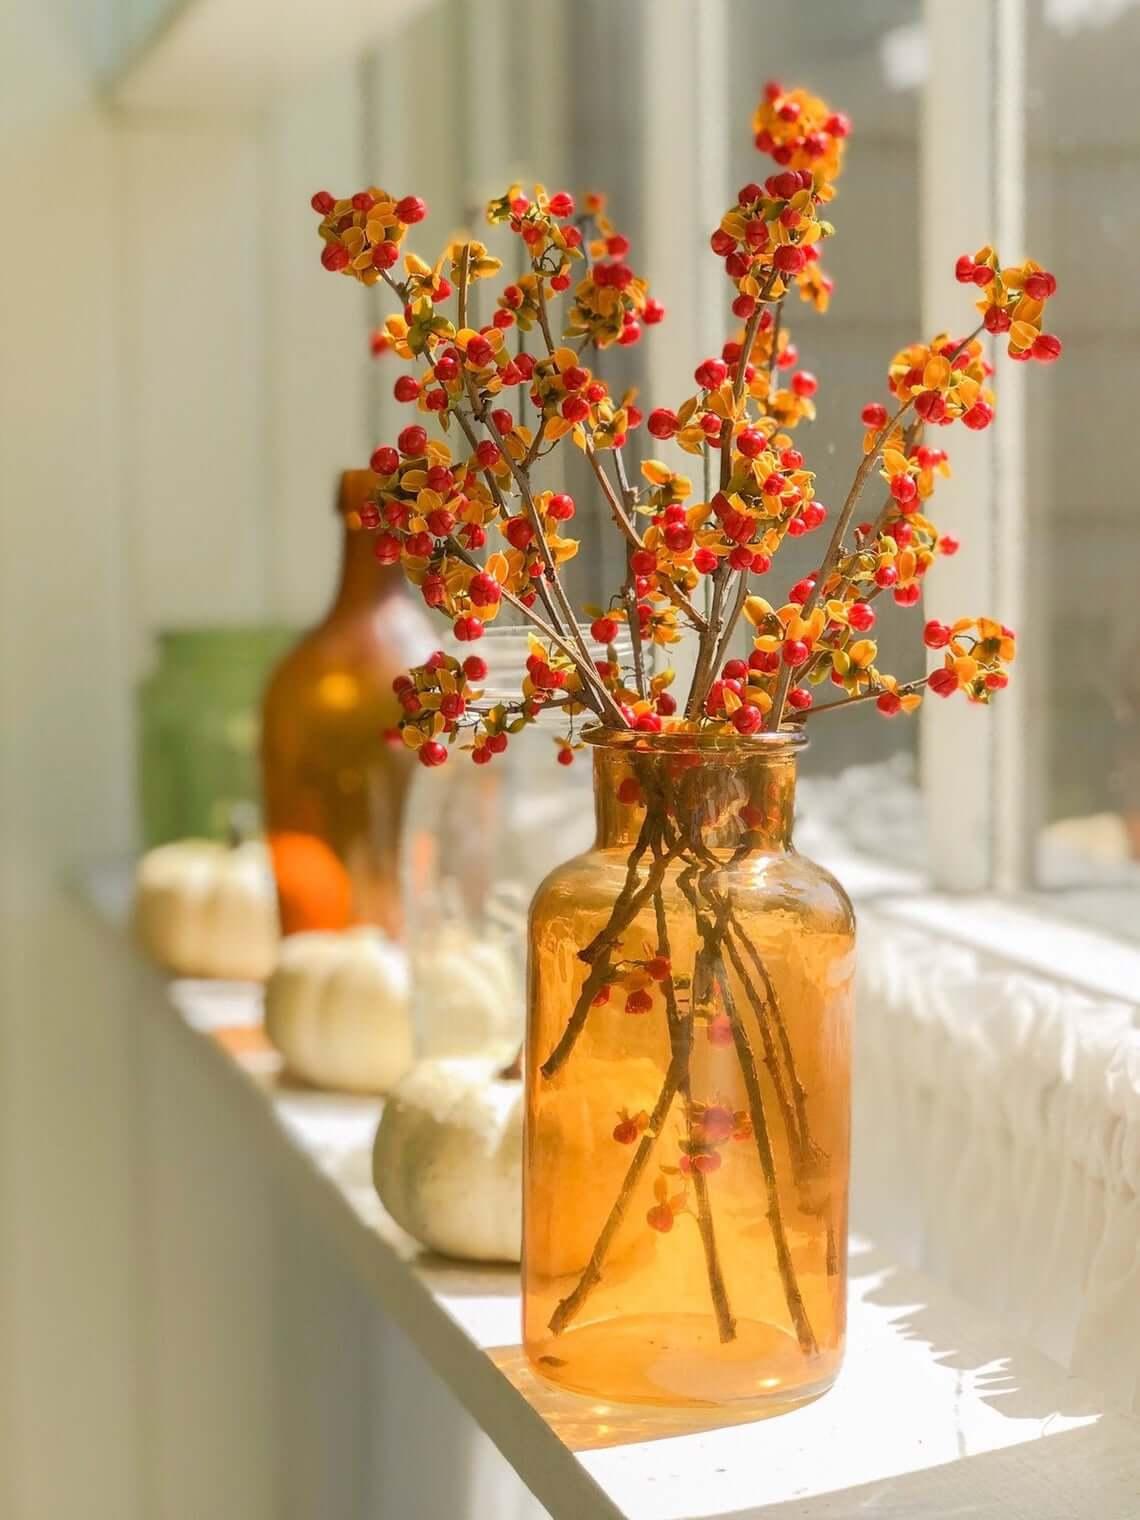 Amber Glass Vase of Fresh Picked Bittersweet